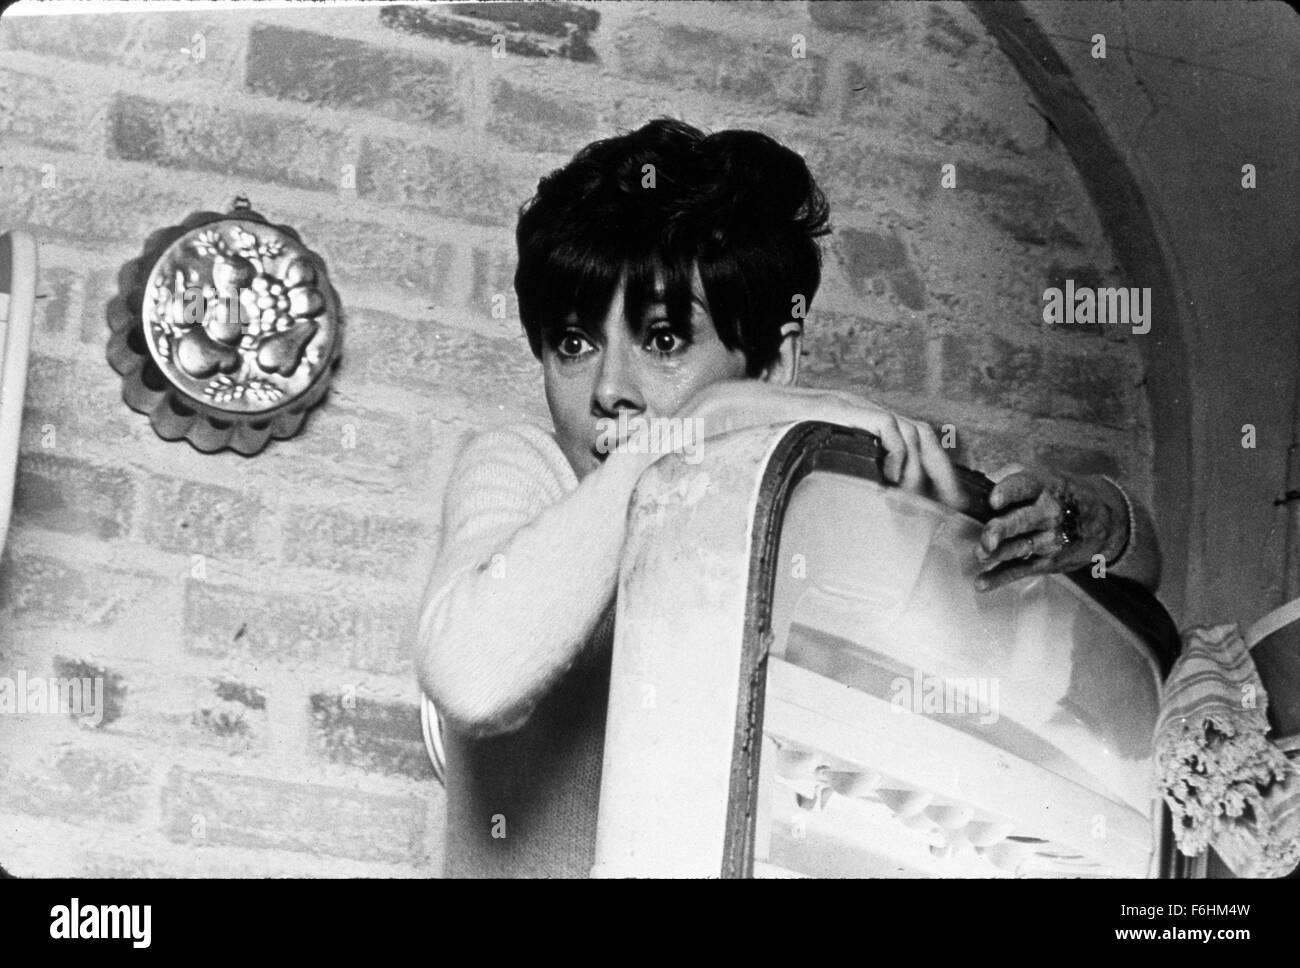 1967, Film Title: WAIT UNTIL DARK, Director: TERENCE YOUNG, Studio: WARNER, Pictured: AUDREY HEPBURN, HIDING, FEAR, - Stock Image